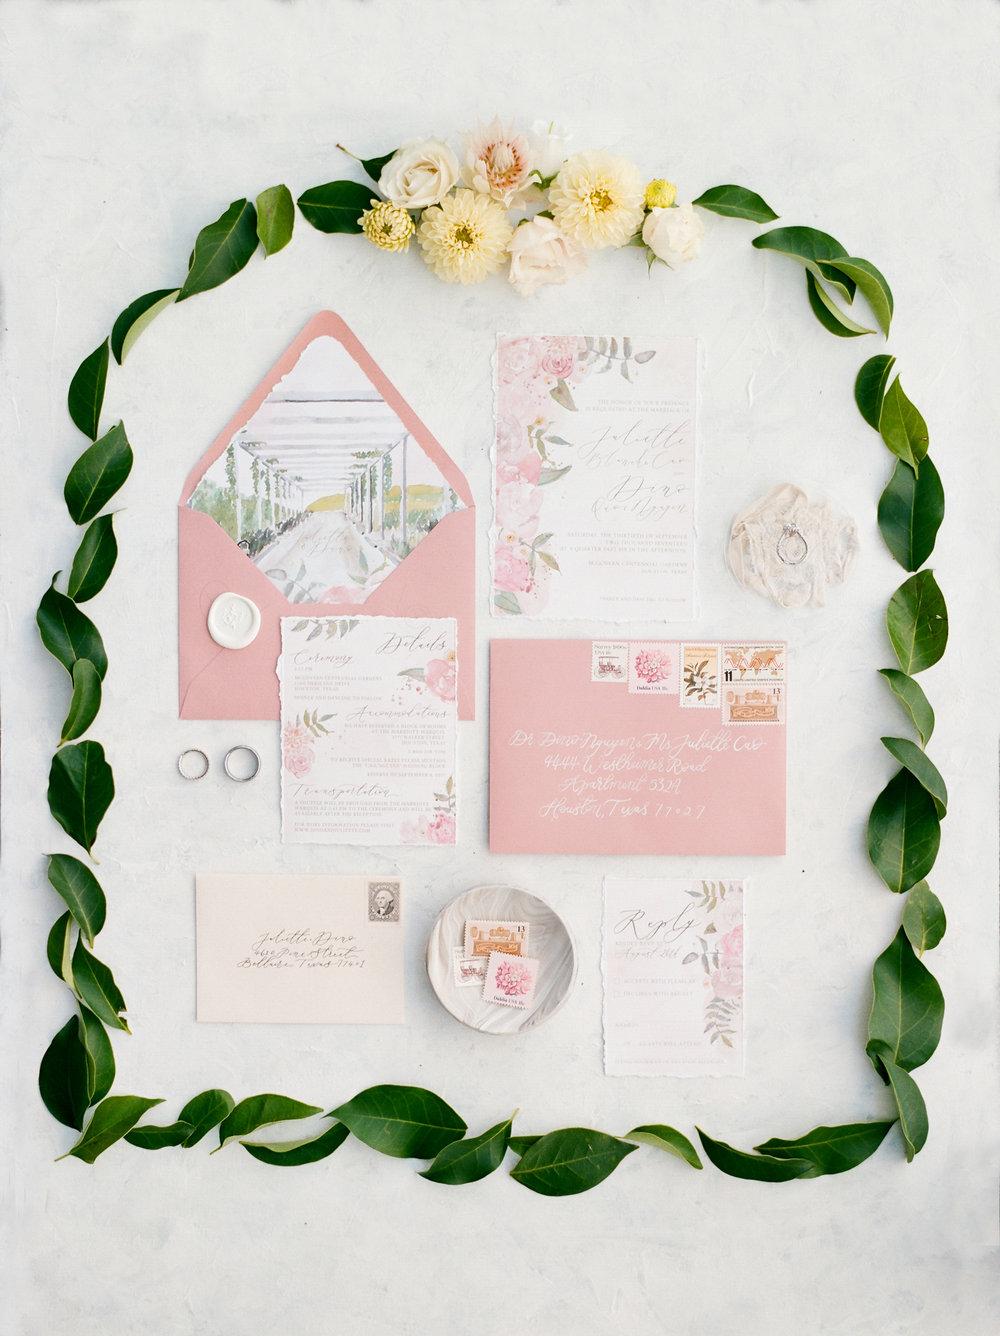 Martha-Stewart-Wedding-Dana-Fernandez-Photography-Josh-Texas-Film-Houston-Wedding-Fine-Art-Photographer-McGovern-Centennial-Gardens-Top-Best-9.jpg